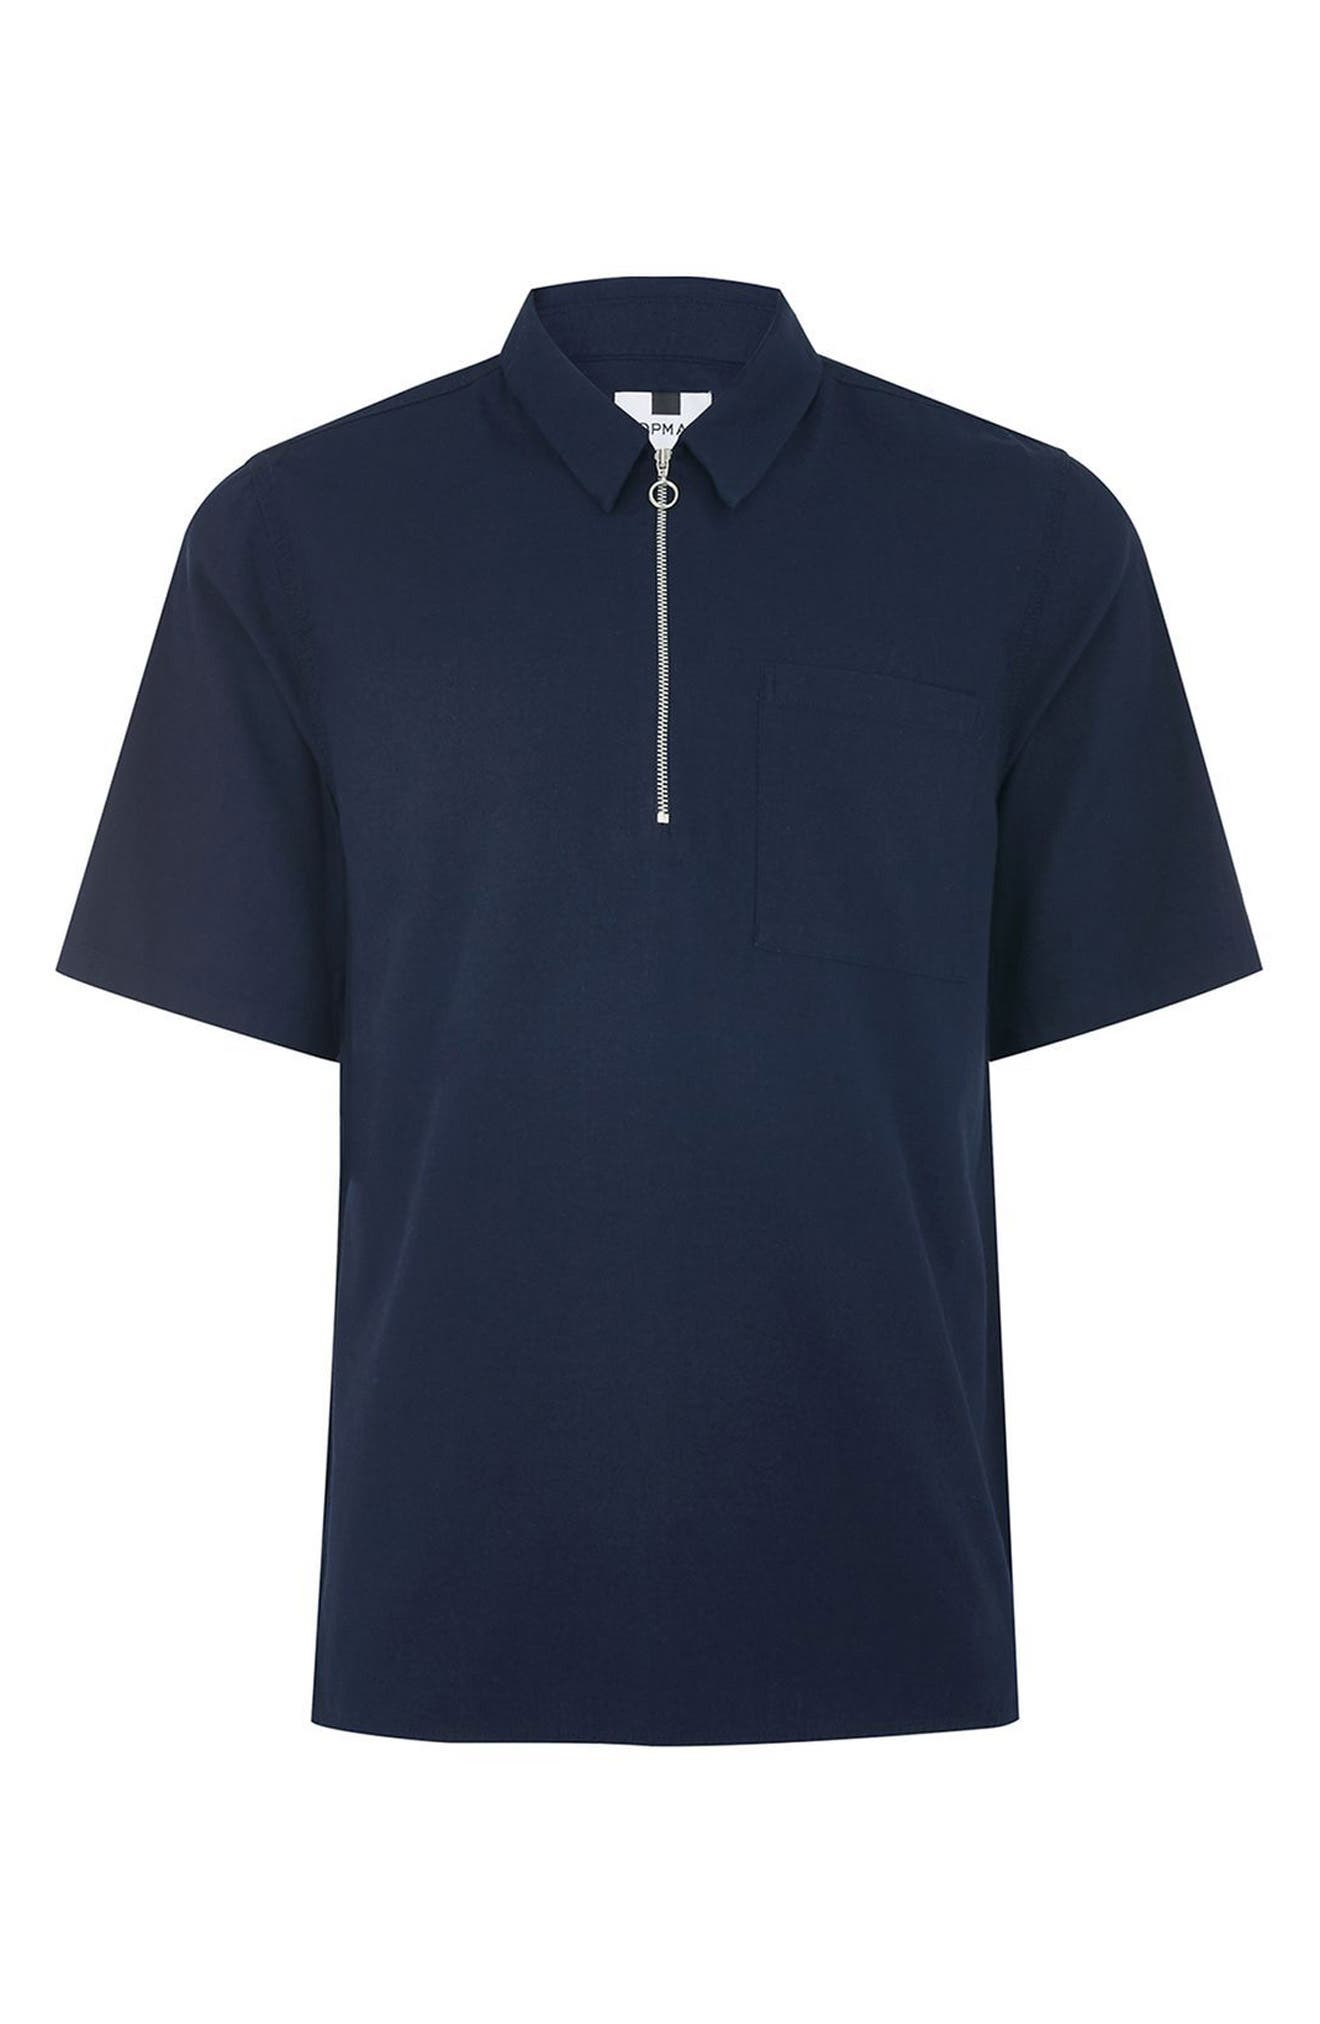 Modern Fit Zip Shirt,                             Alternate thumbnail 4, color,                             Navy